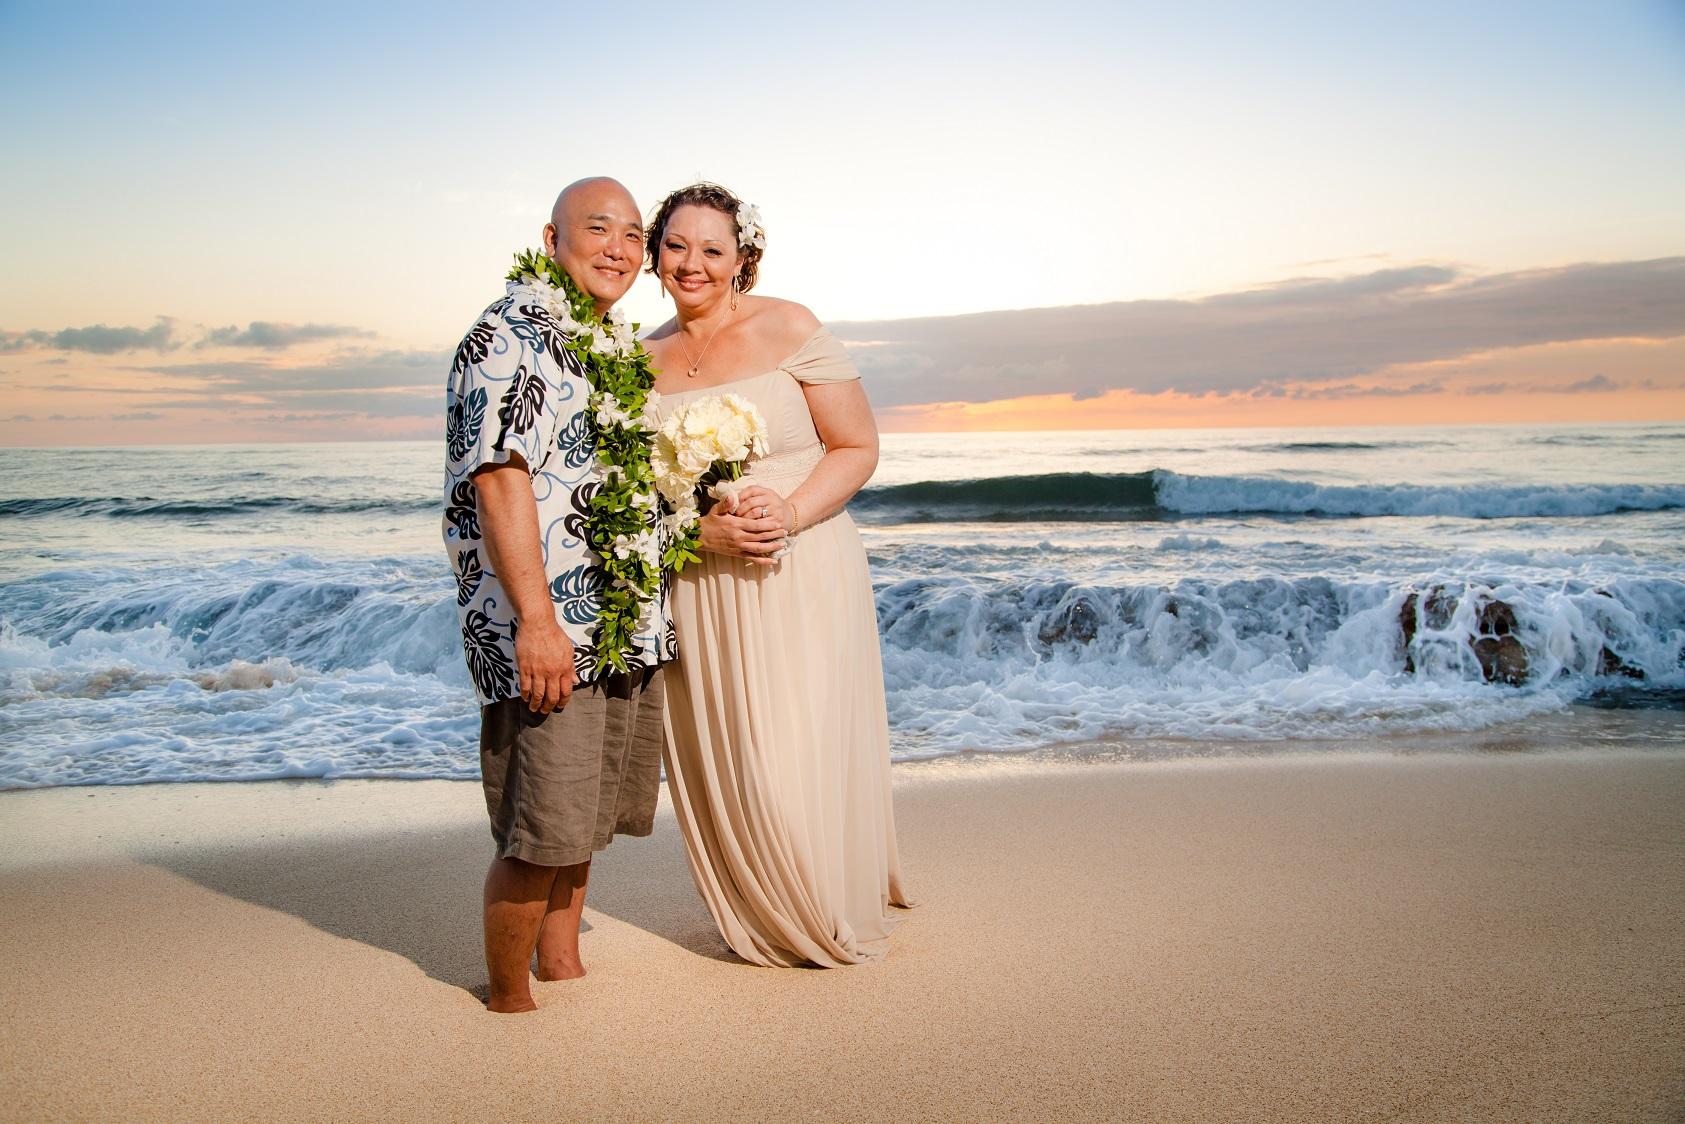 oahu north shore vow renewal anniversary beach portraits